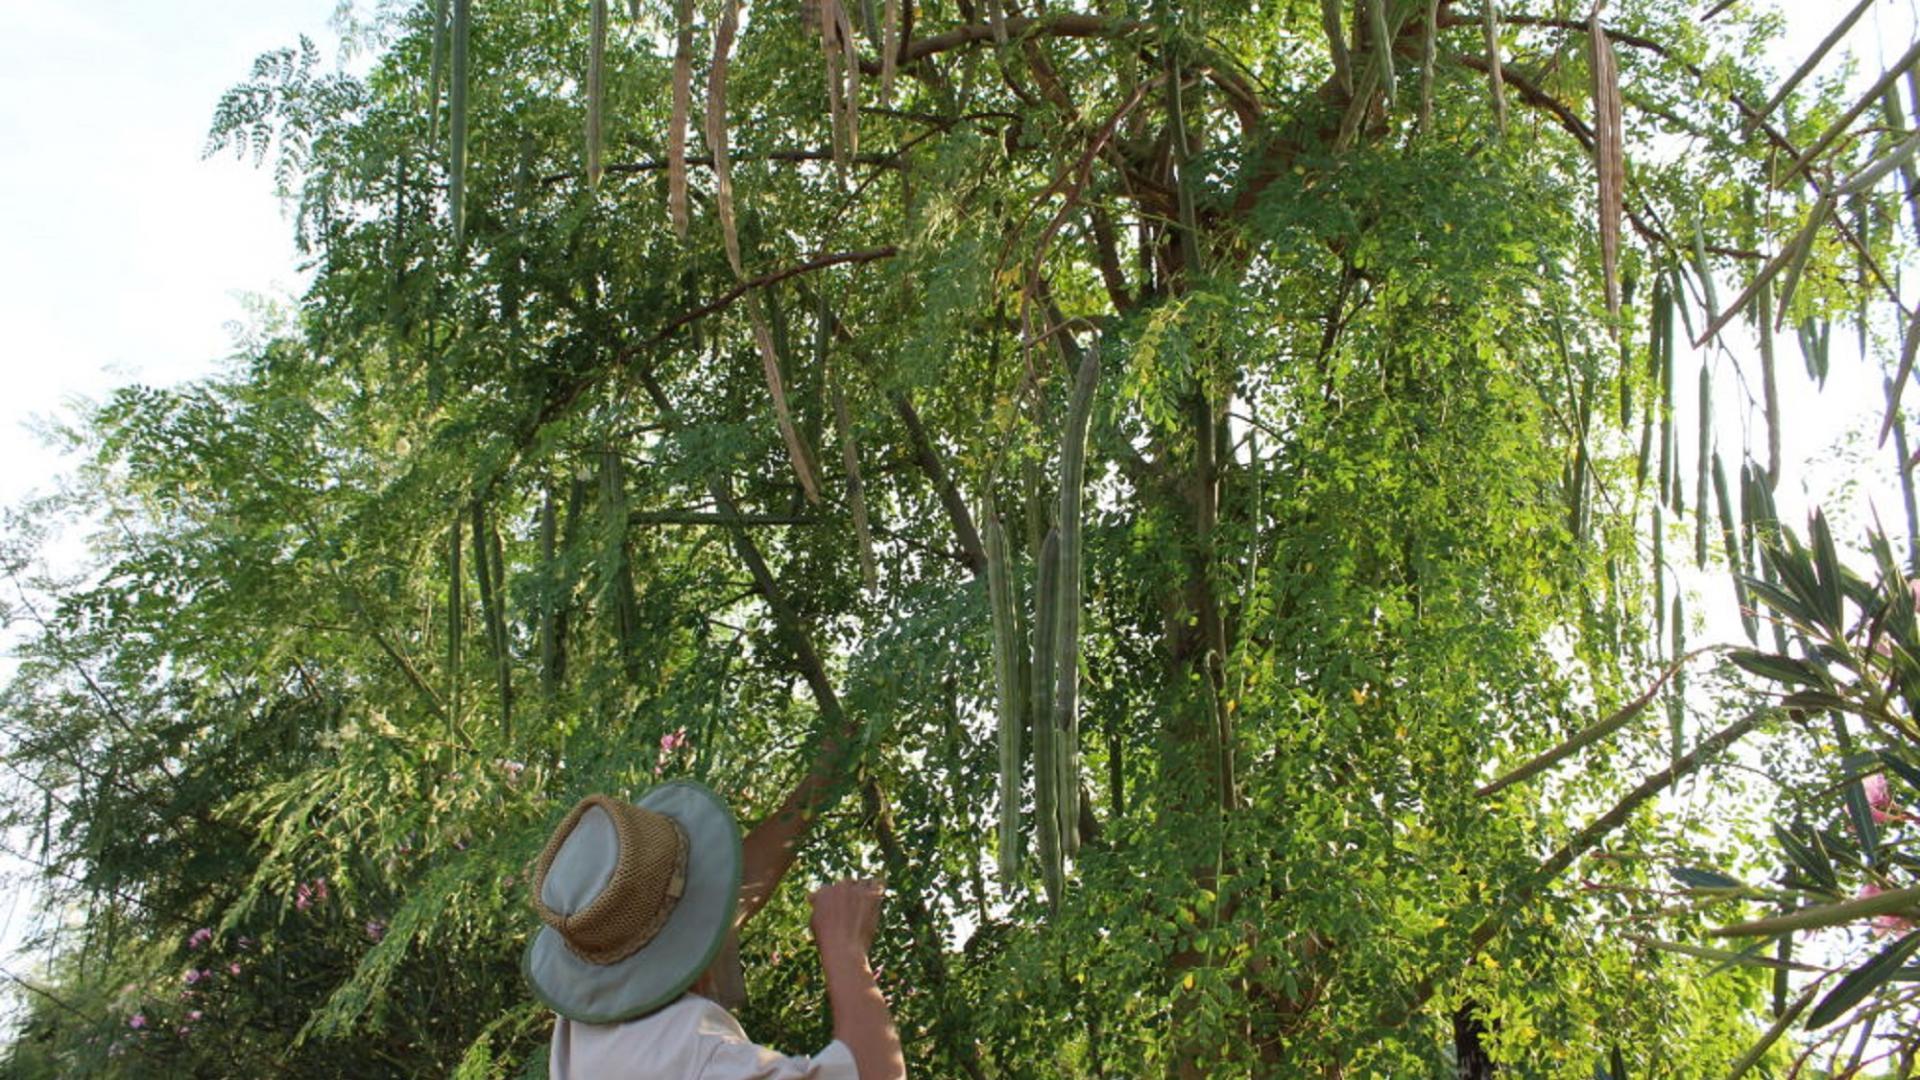 Baum, Mann, Moringa, Pflanze